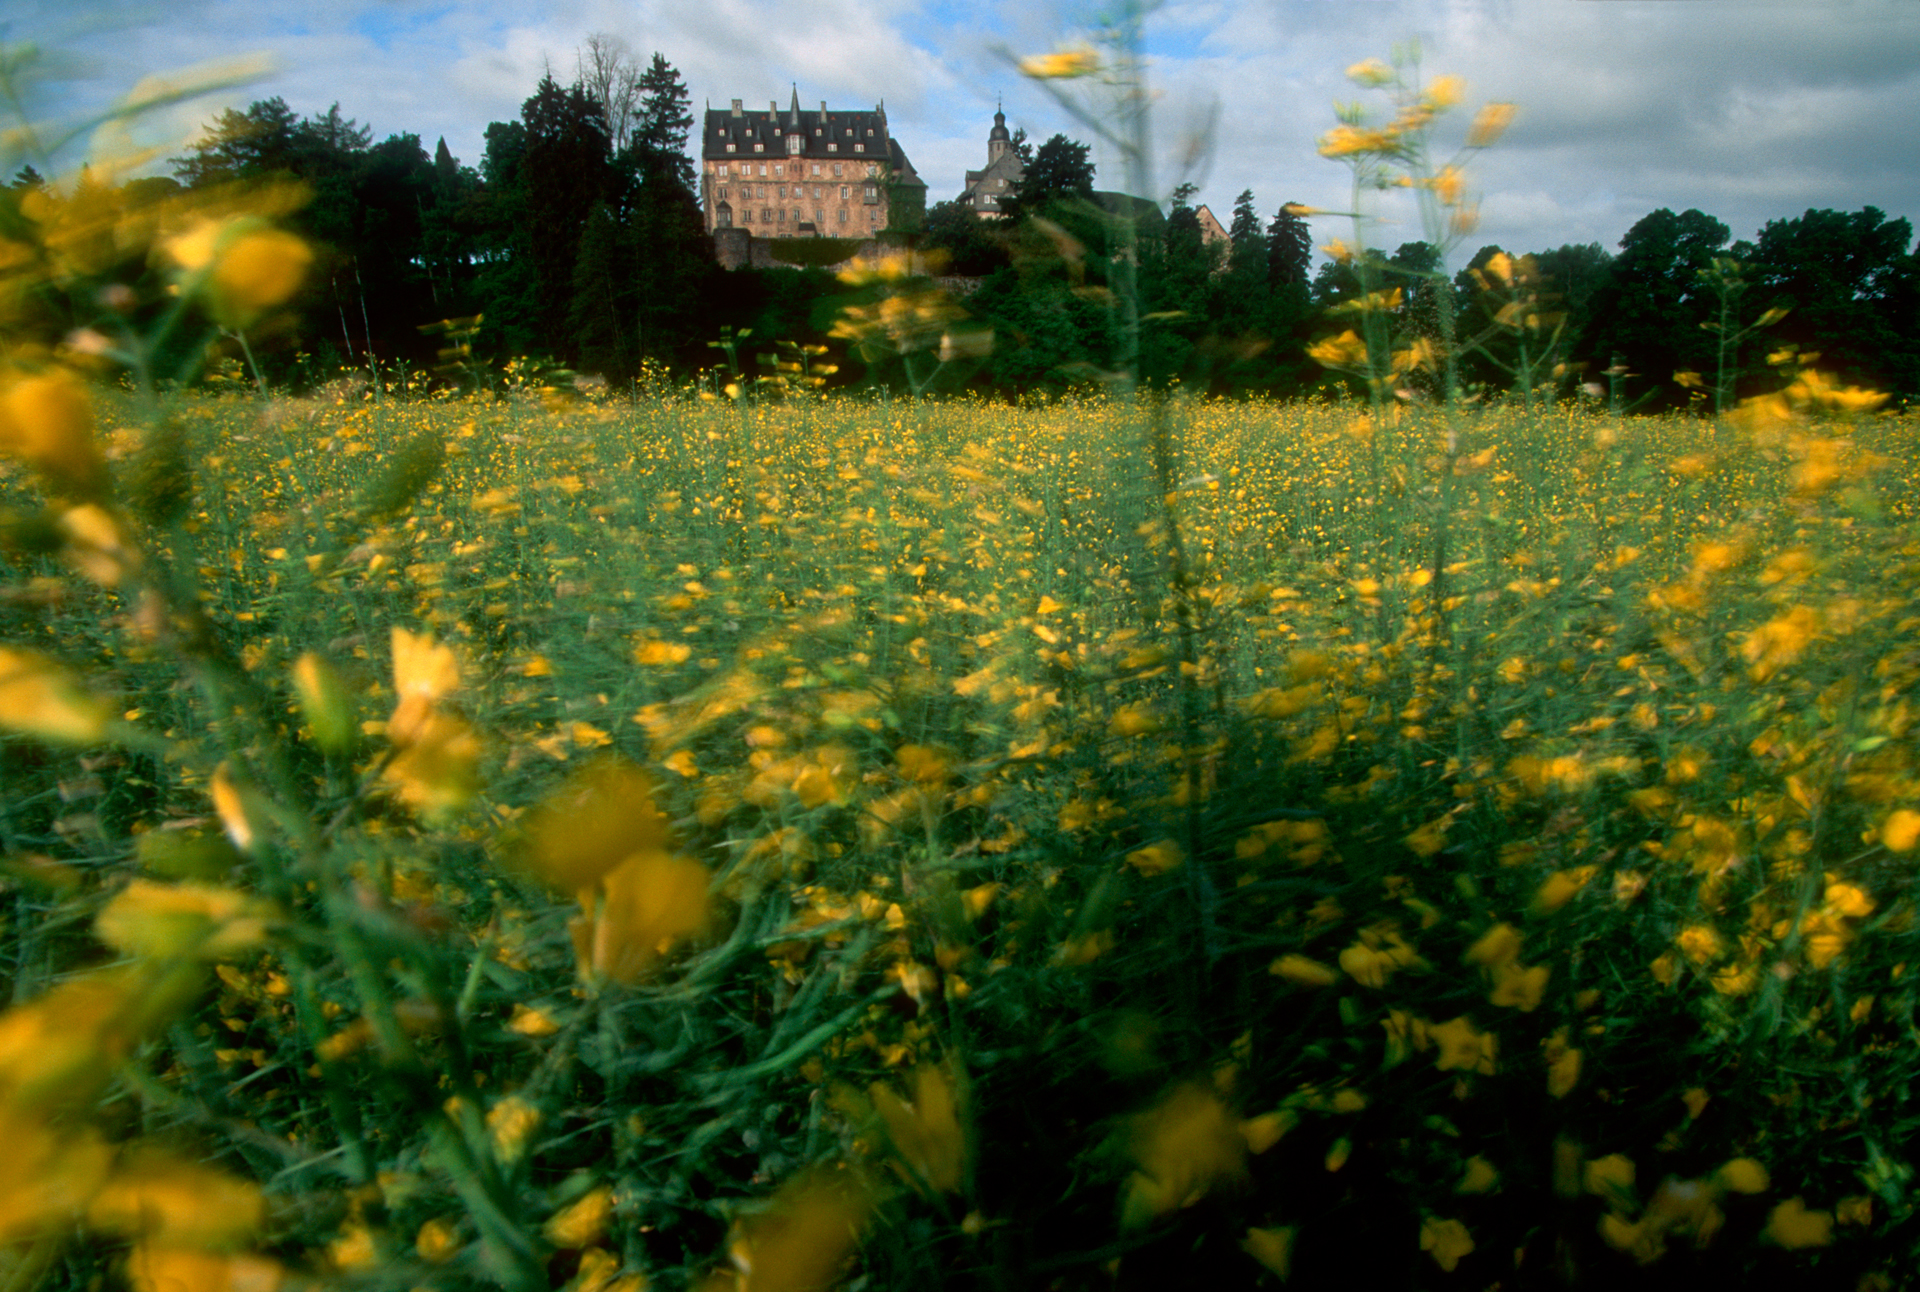 Blossoms fill the fields around Eisenbach Castle.  Eisenbach castle, Lauterbach, Germany